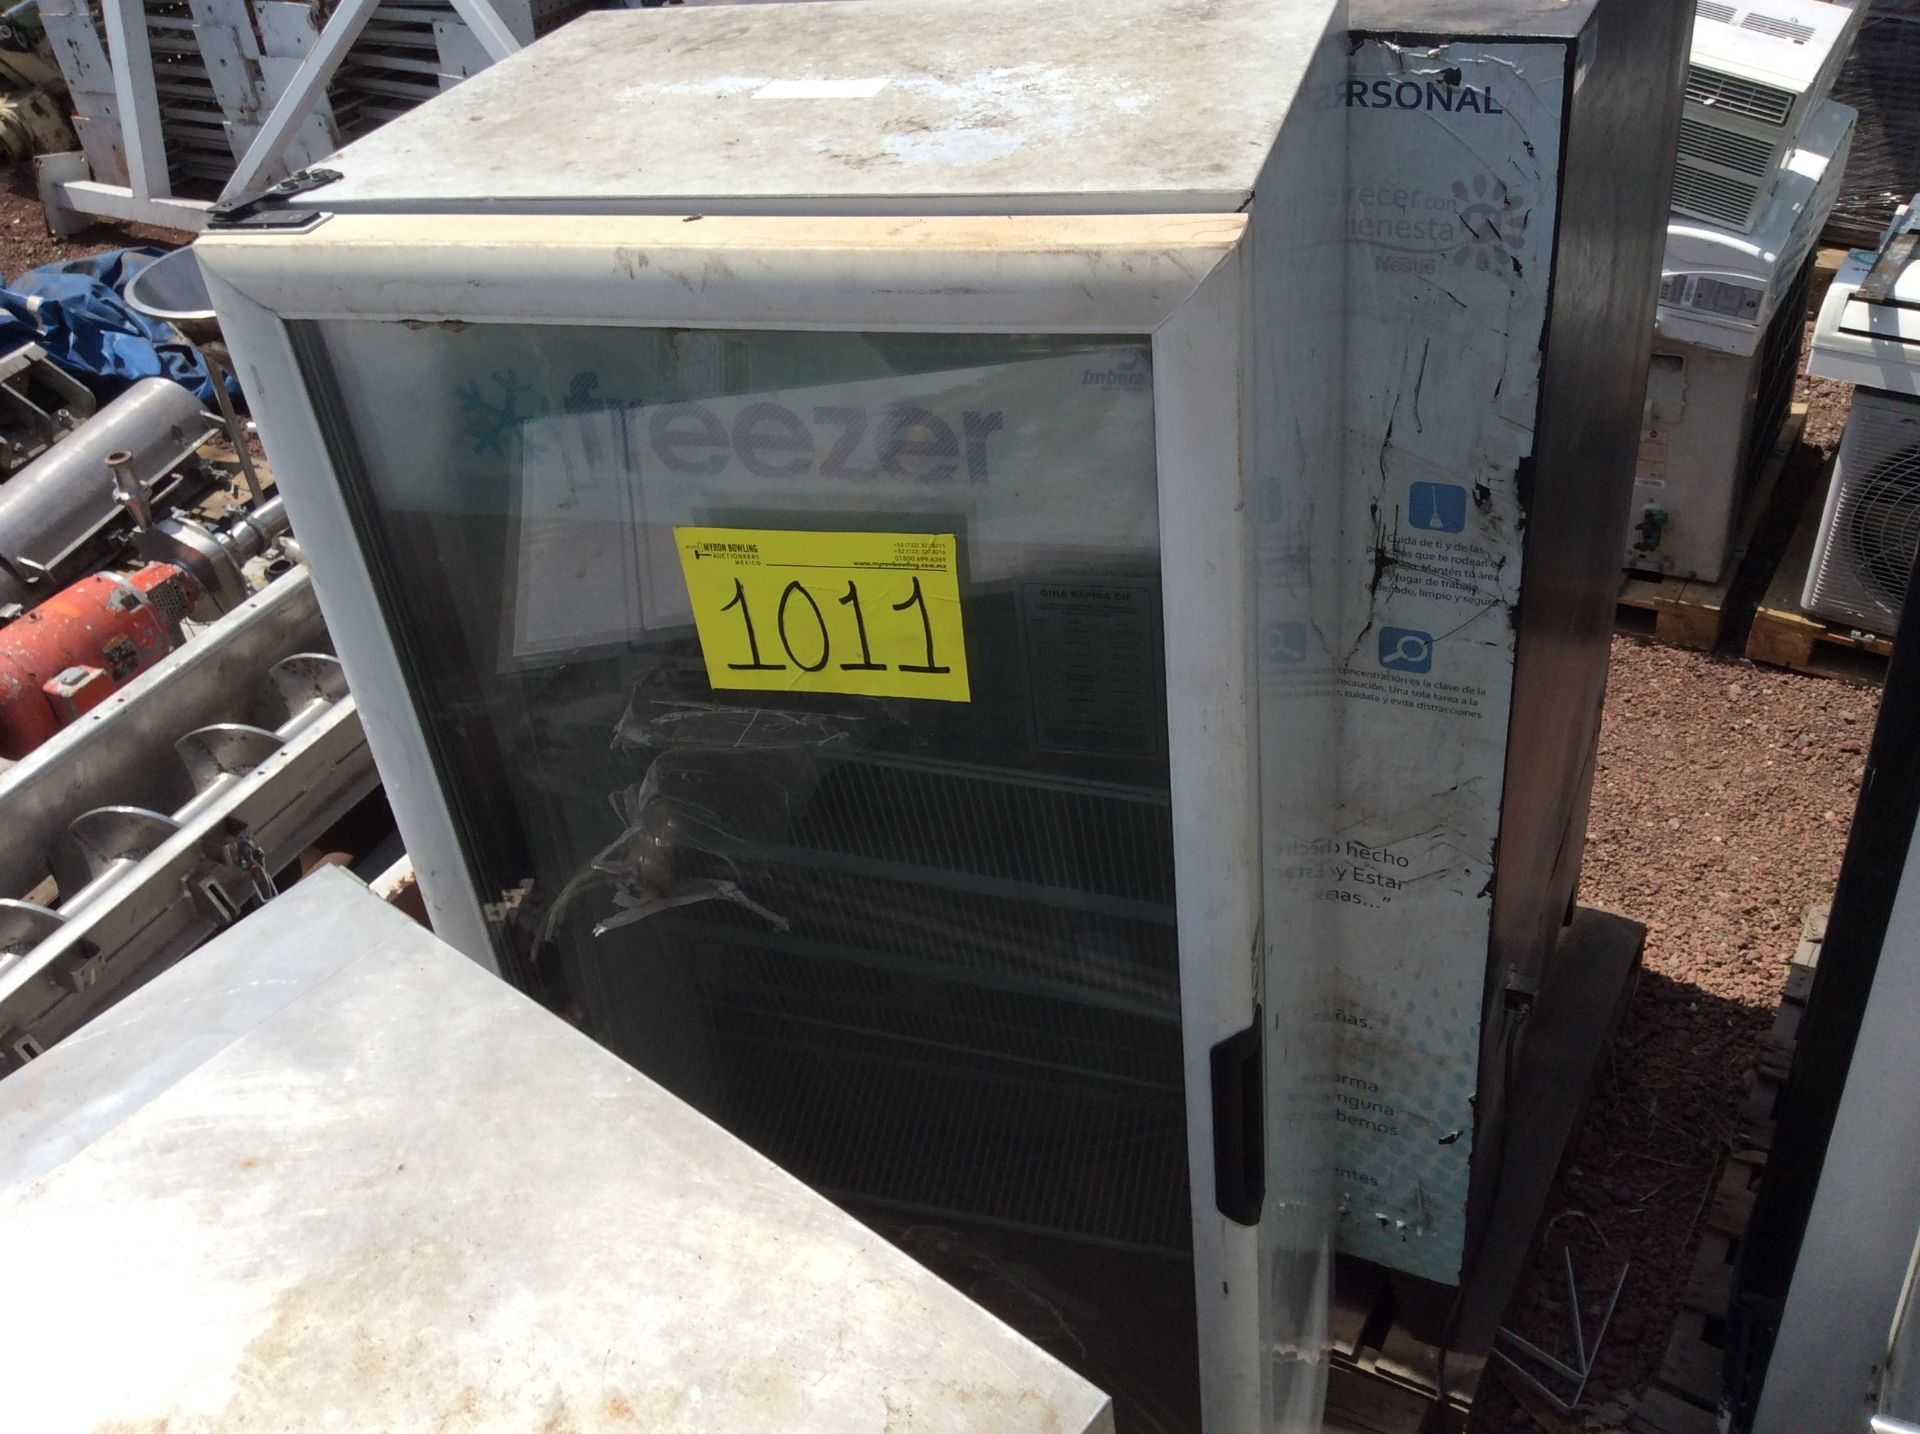 1 Ojeda refrigerator of double glass door model RV2P36 serial number 0636323-34305 120V - Image 14 of 14